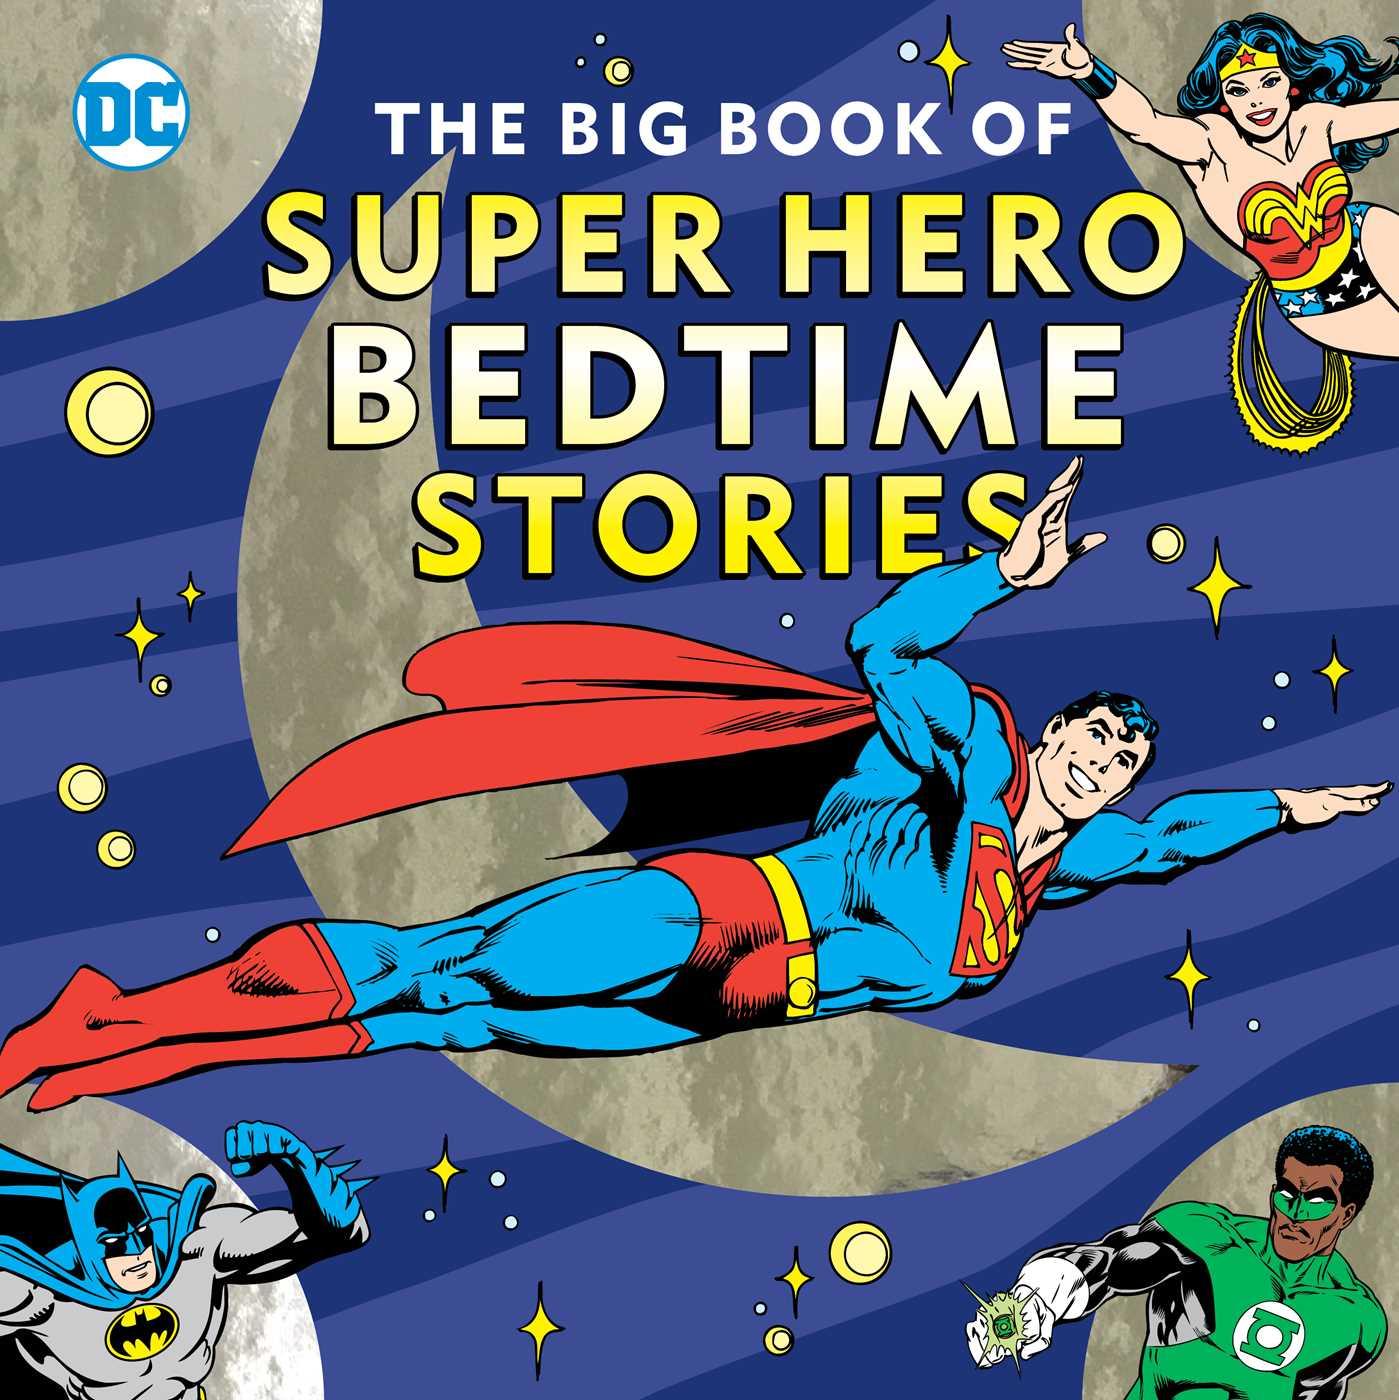 The big book of super hero bedtime stories 9781941367568 hr